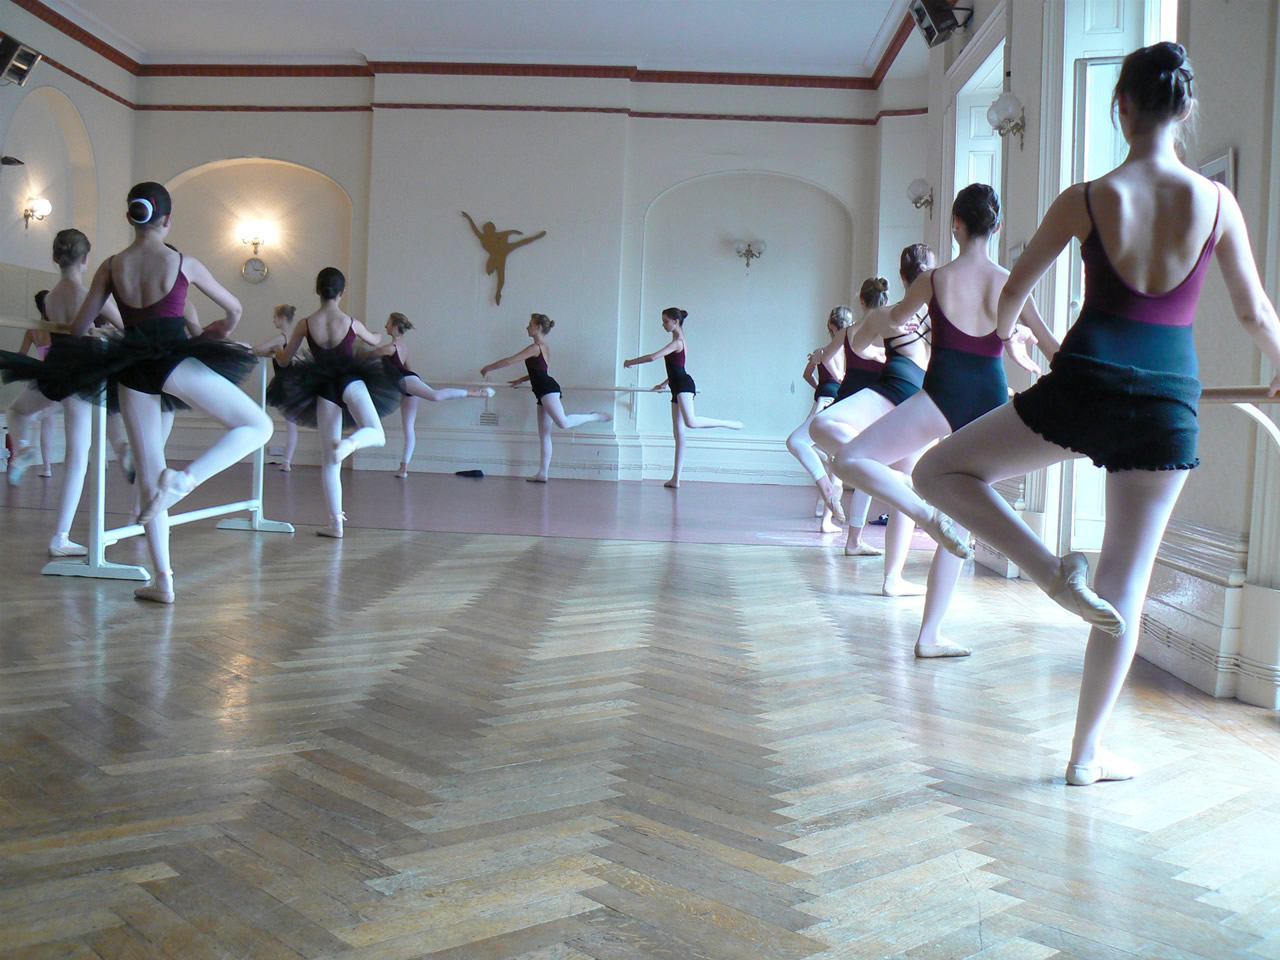 Academia de ballet en latex 7